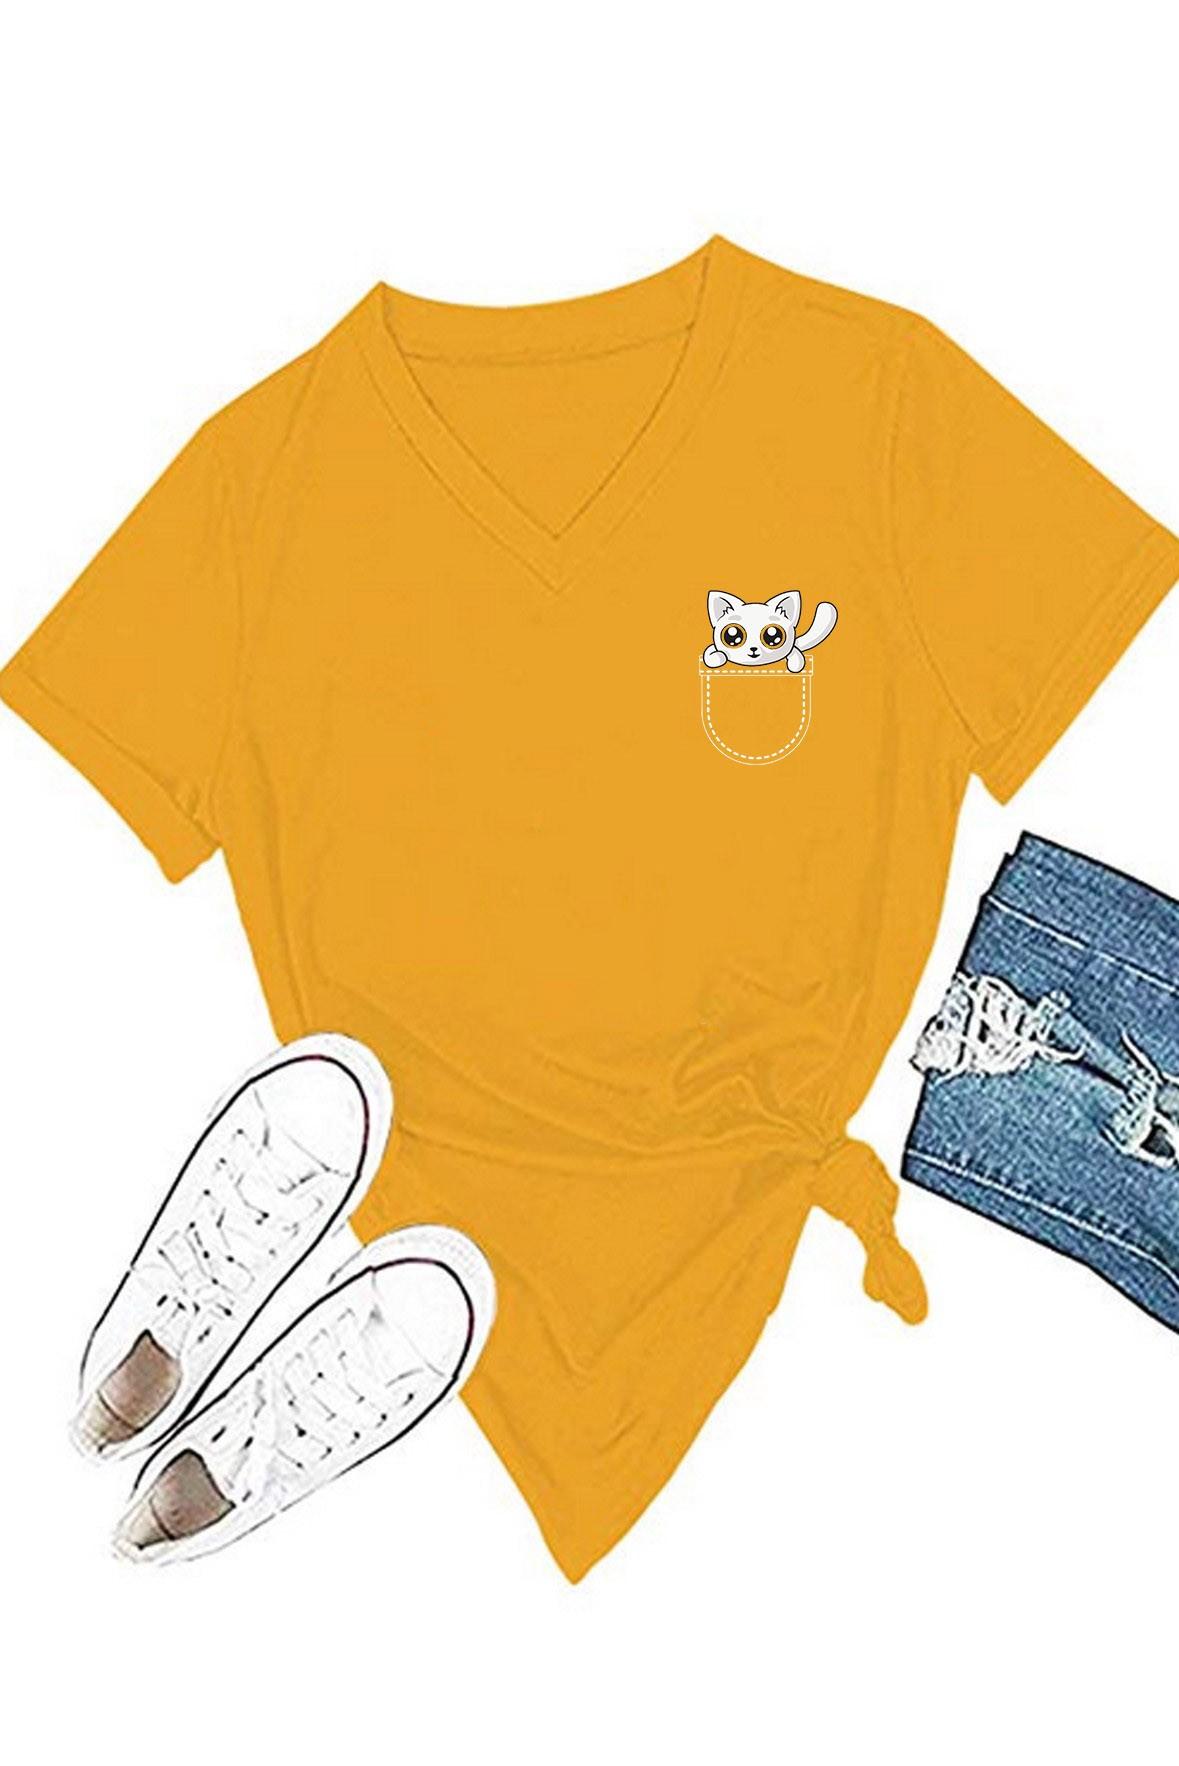 Jeb Mein Billi Boyfriend T-Shirt Mustard